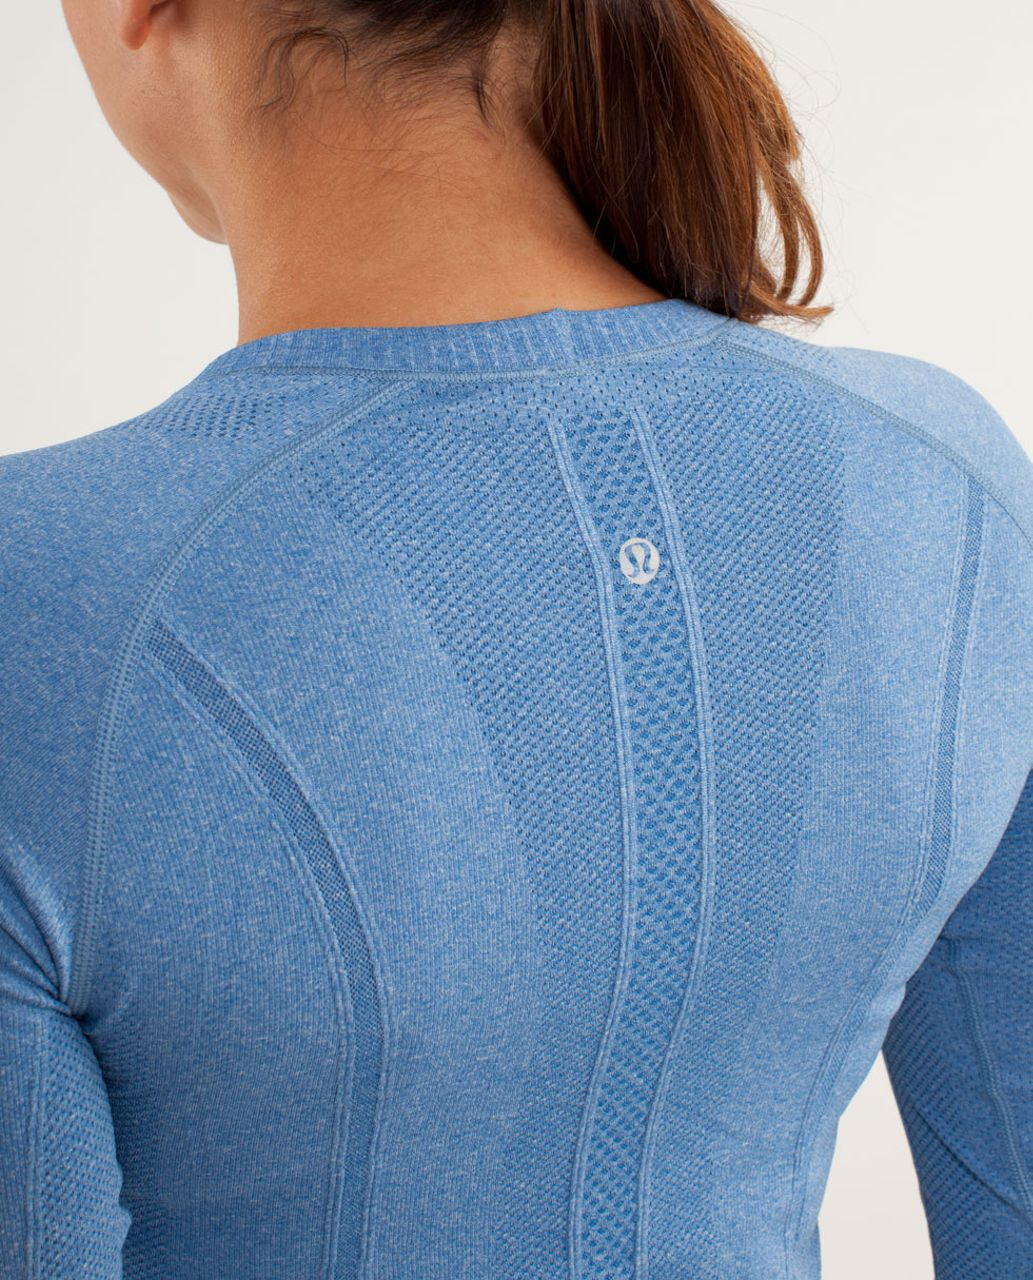 Lululemon Run:  Swiftly Tech Long Sleeve - Limitless Blue